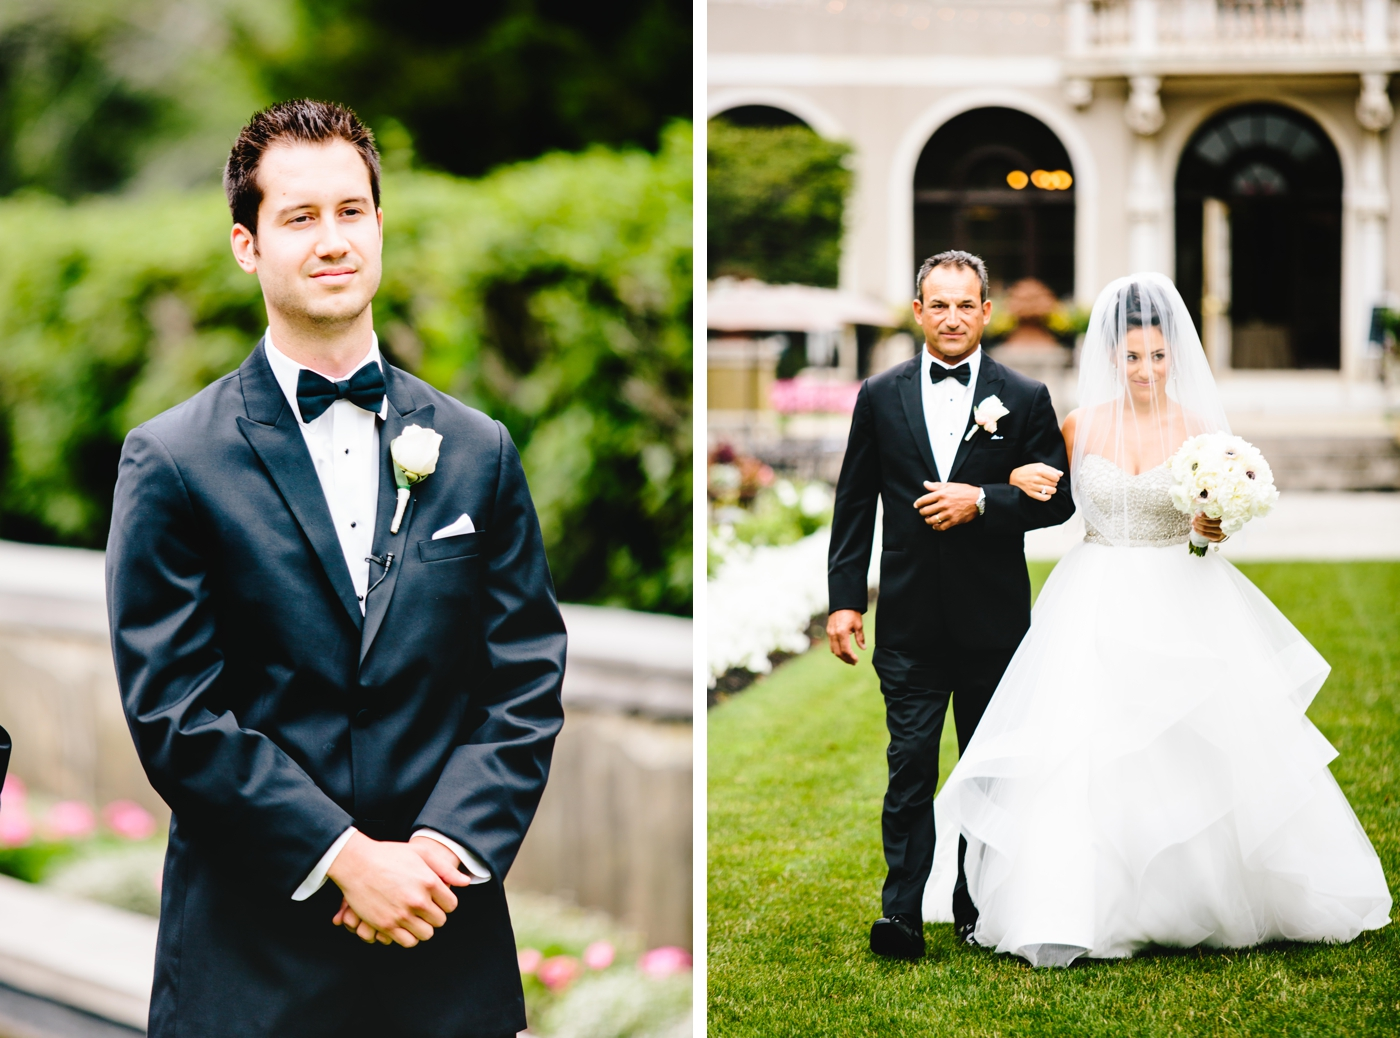 chicago-fine-art-wedding-photography-smeja22